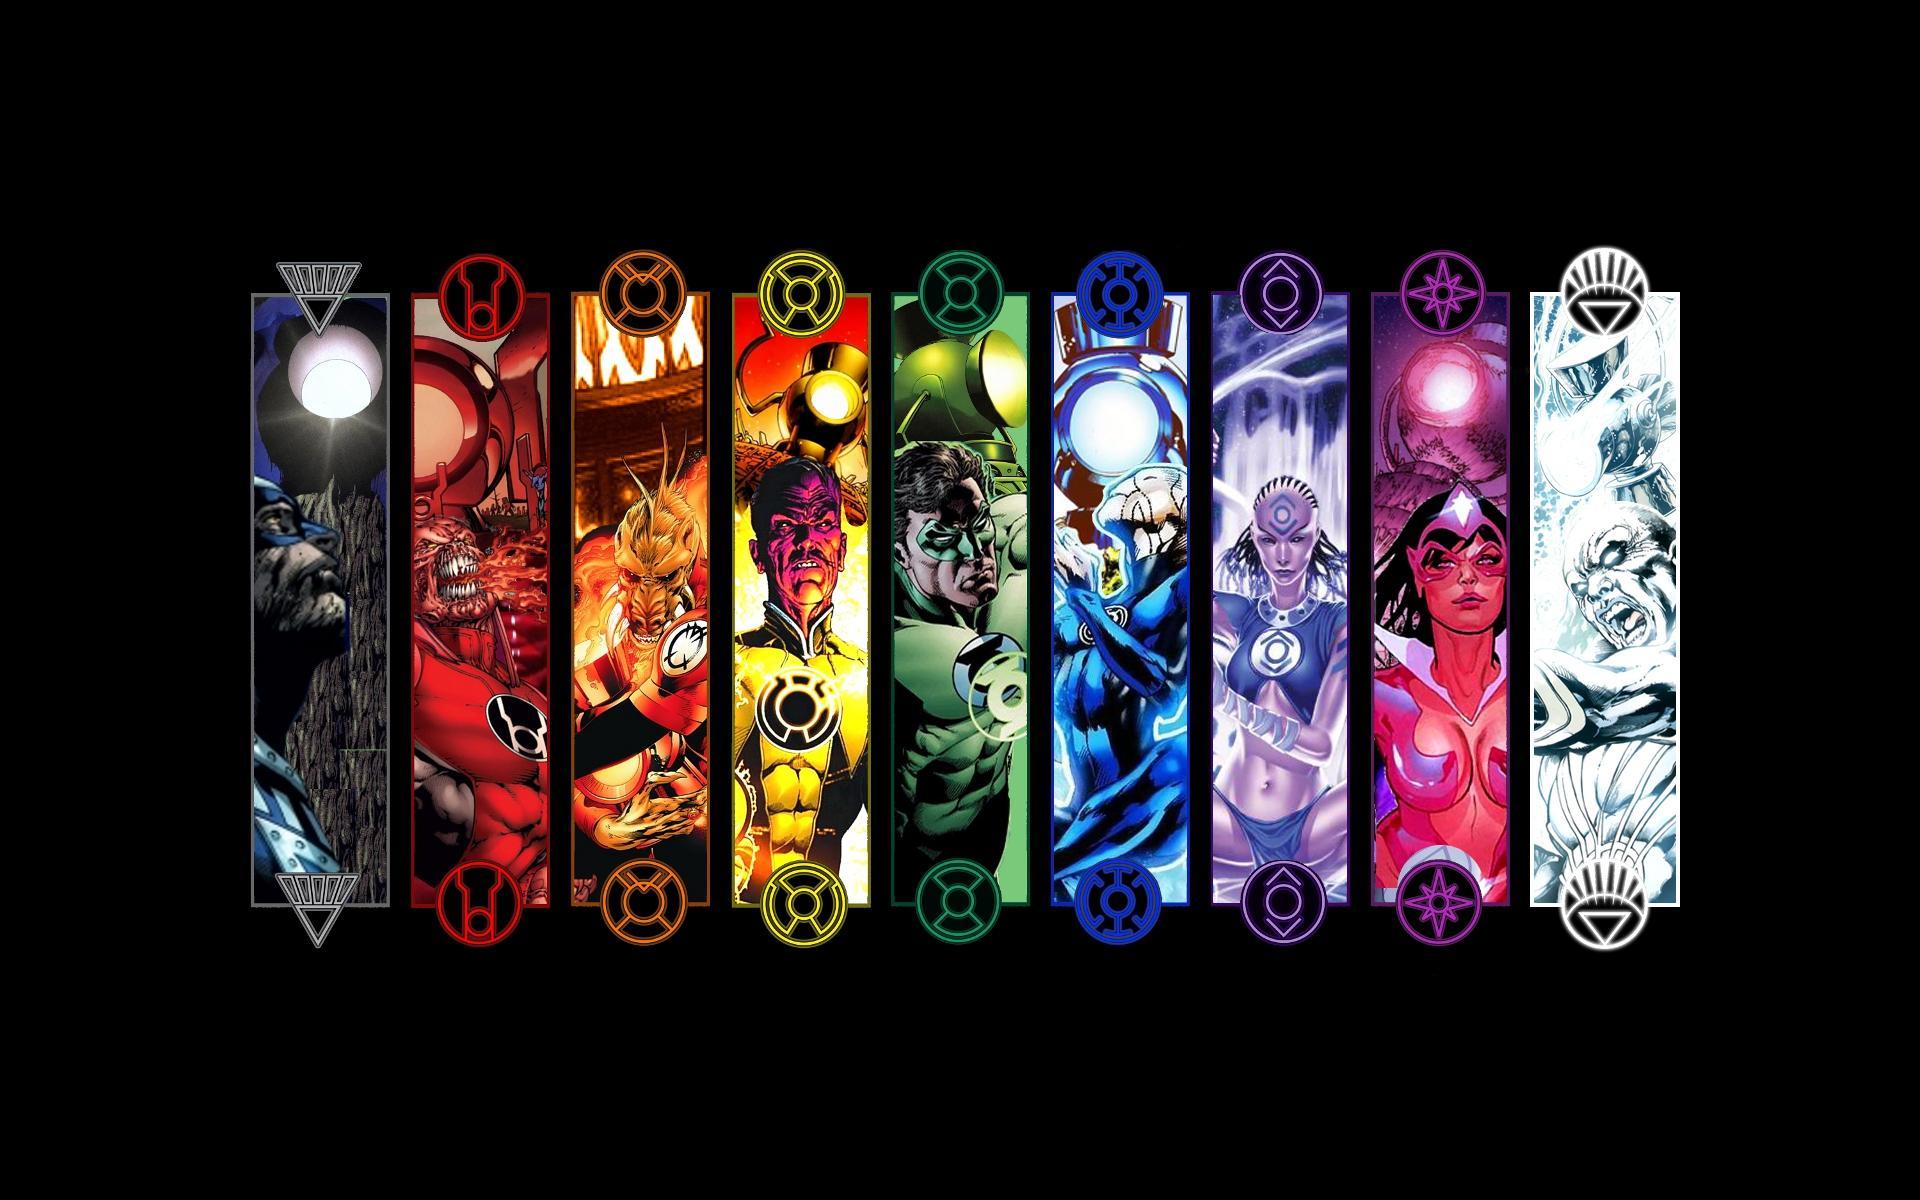 Green Lantern Corps Computer Wallpapers Desktop Backgrounds 1920x1200